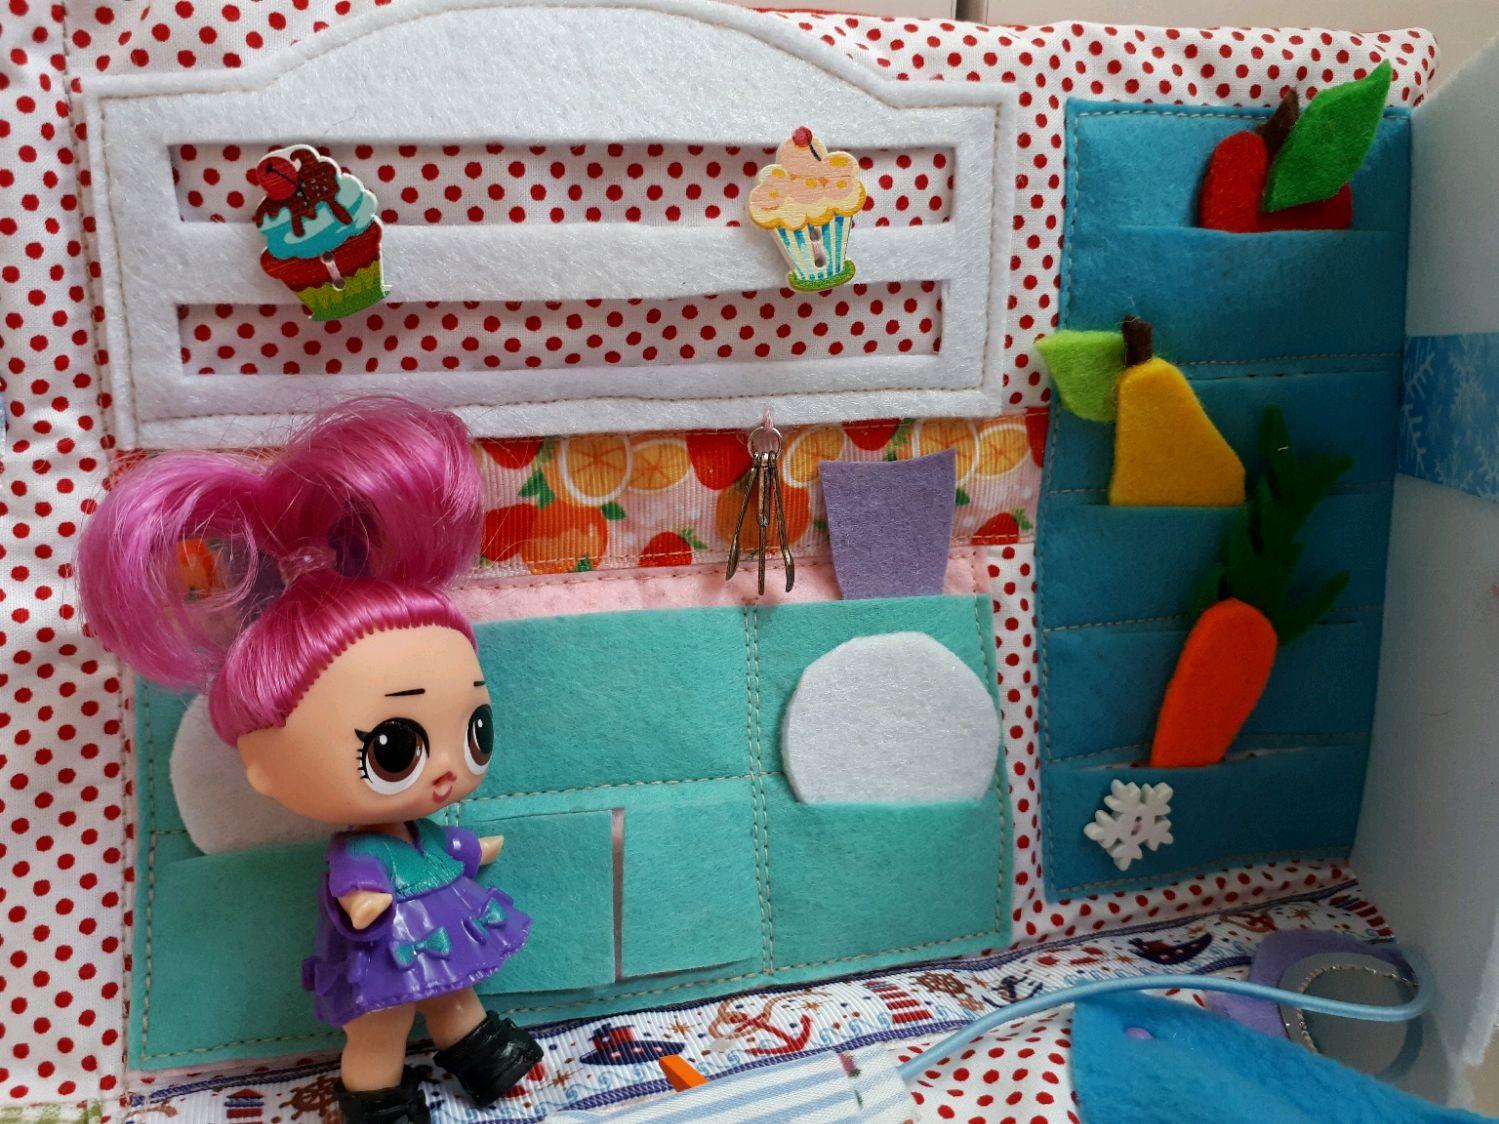 Домик для куклы лол-LOL, Мягкие игрушки, Ялта,  Фото №1